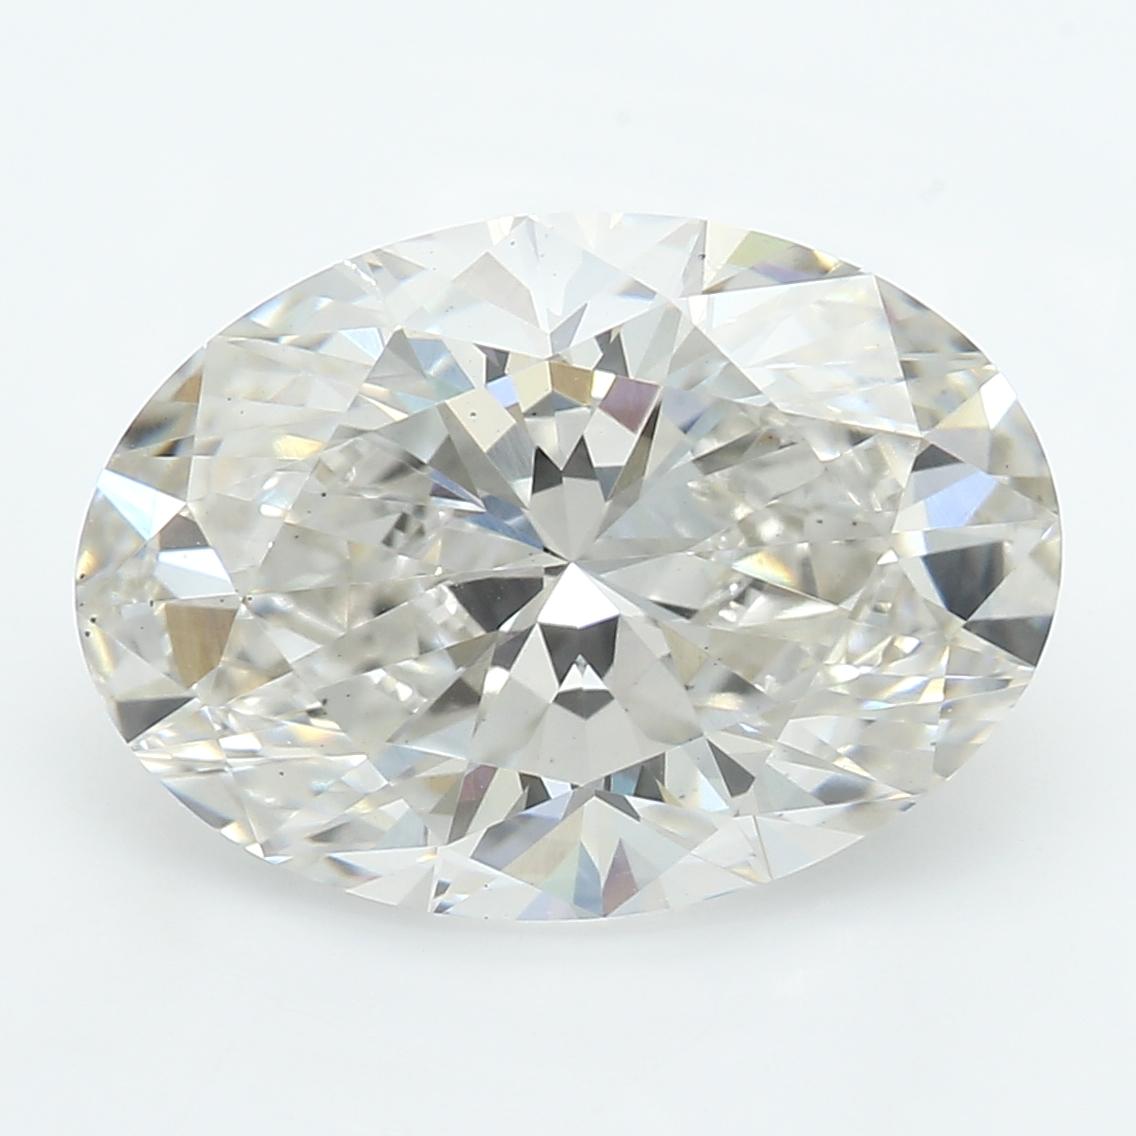 2.61 Carat I-VS2 Excellent Oval Diamond